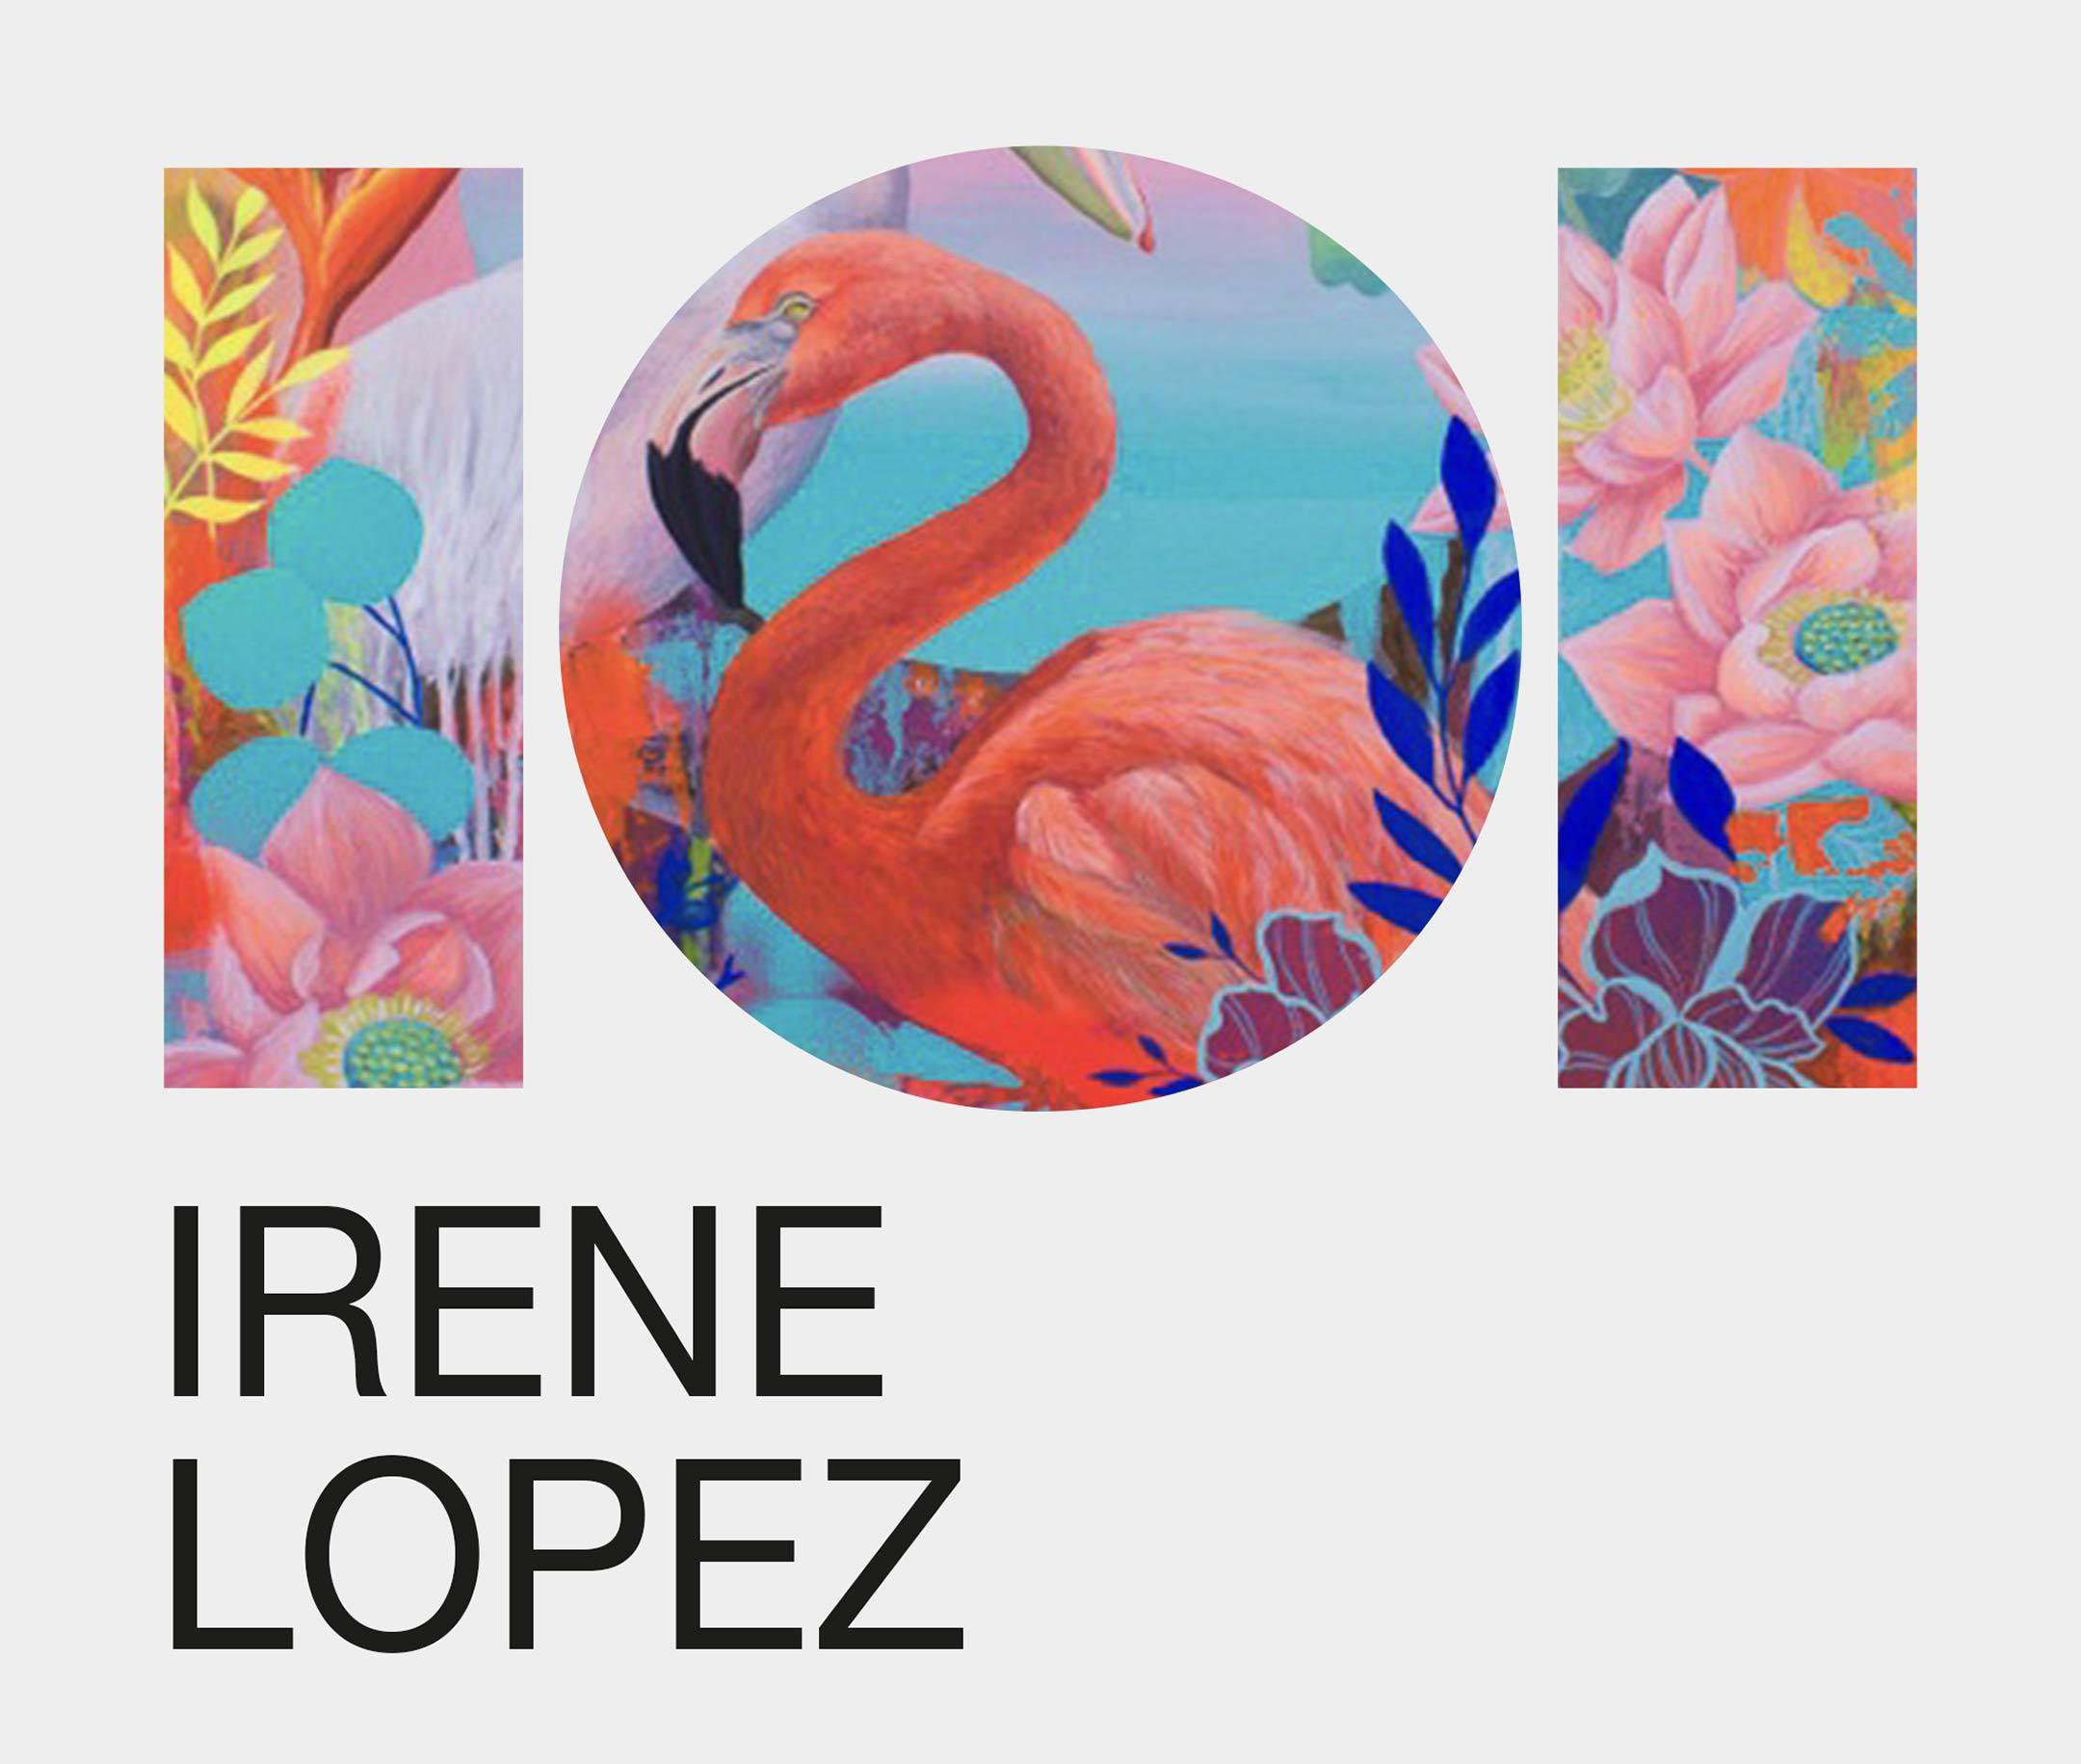 IRENE-LOPEZ_IG